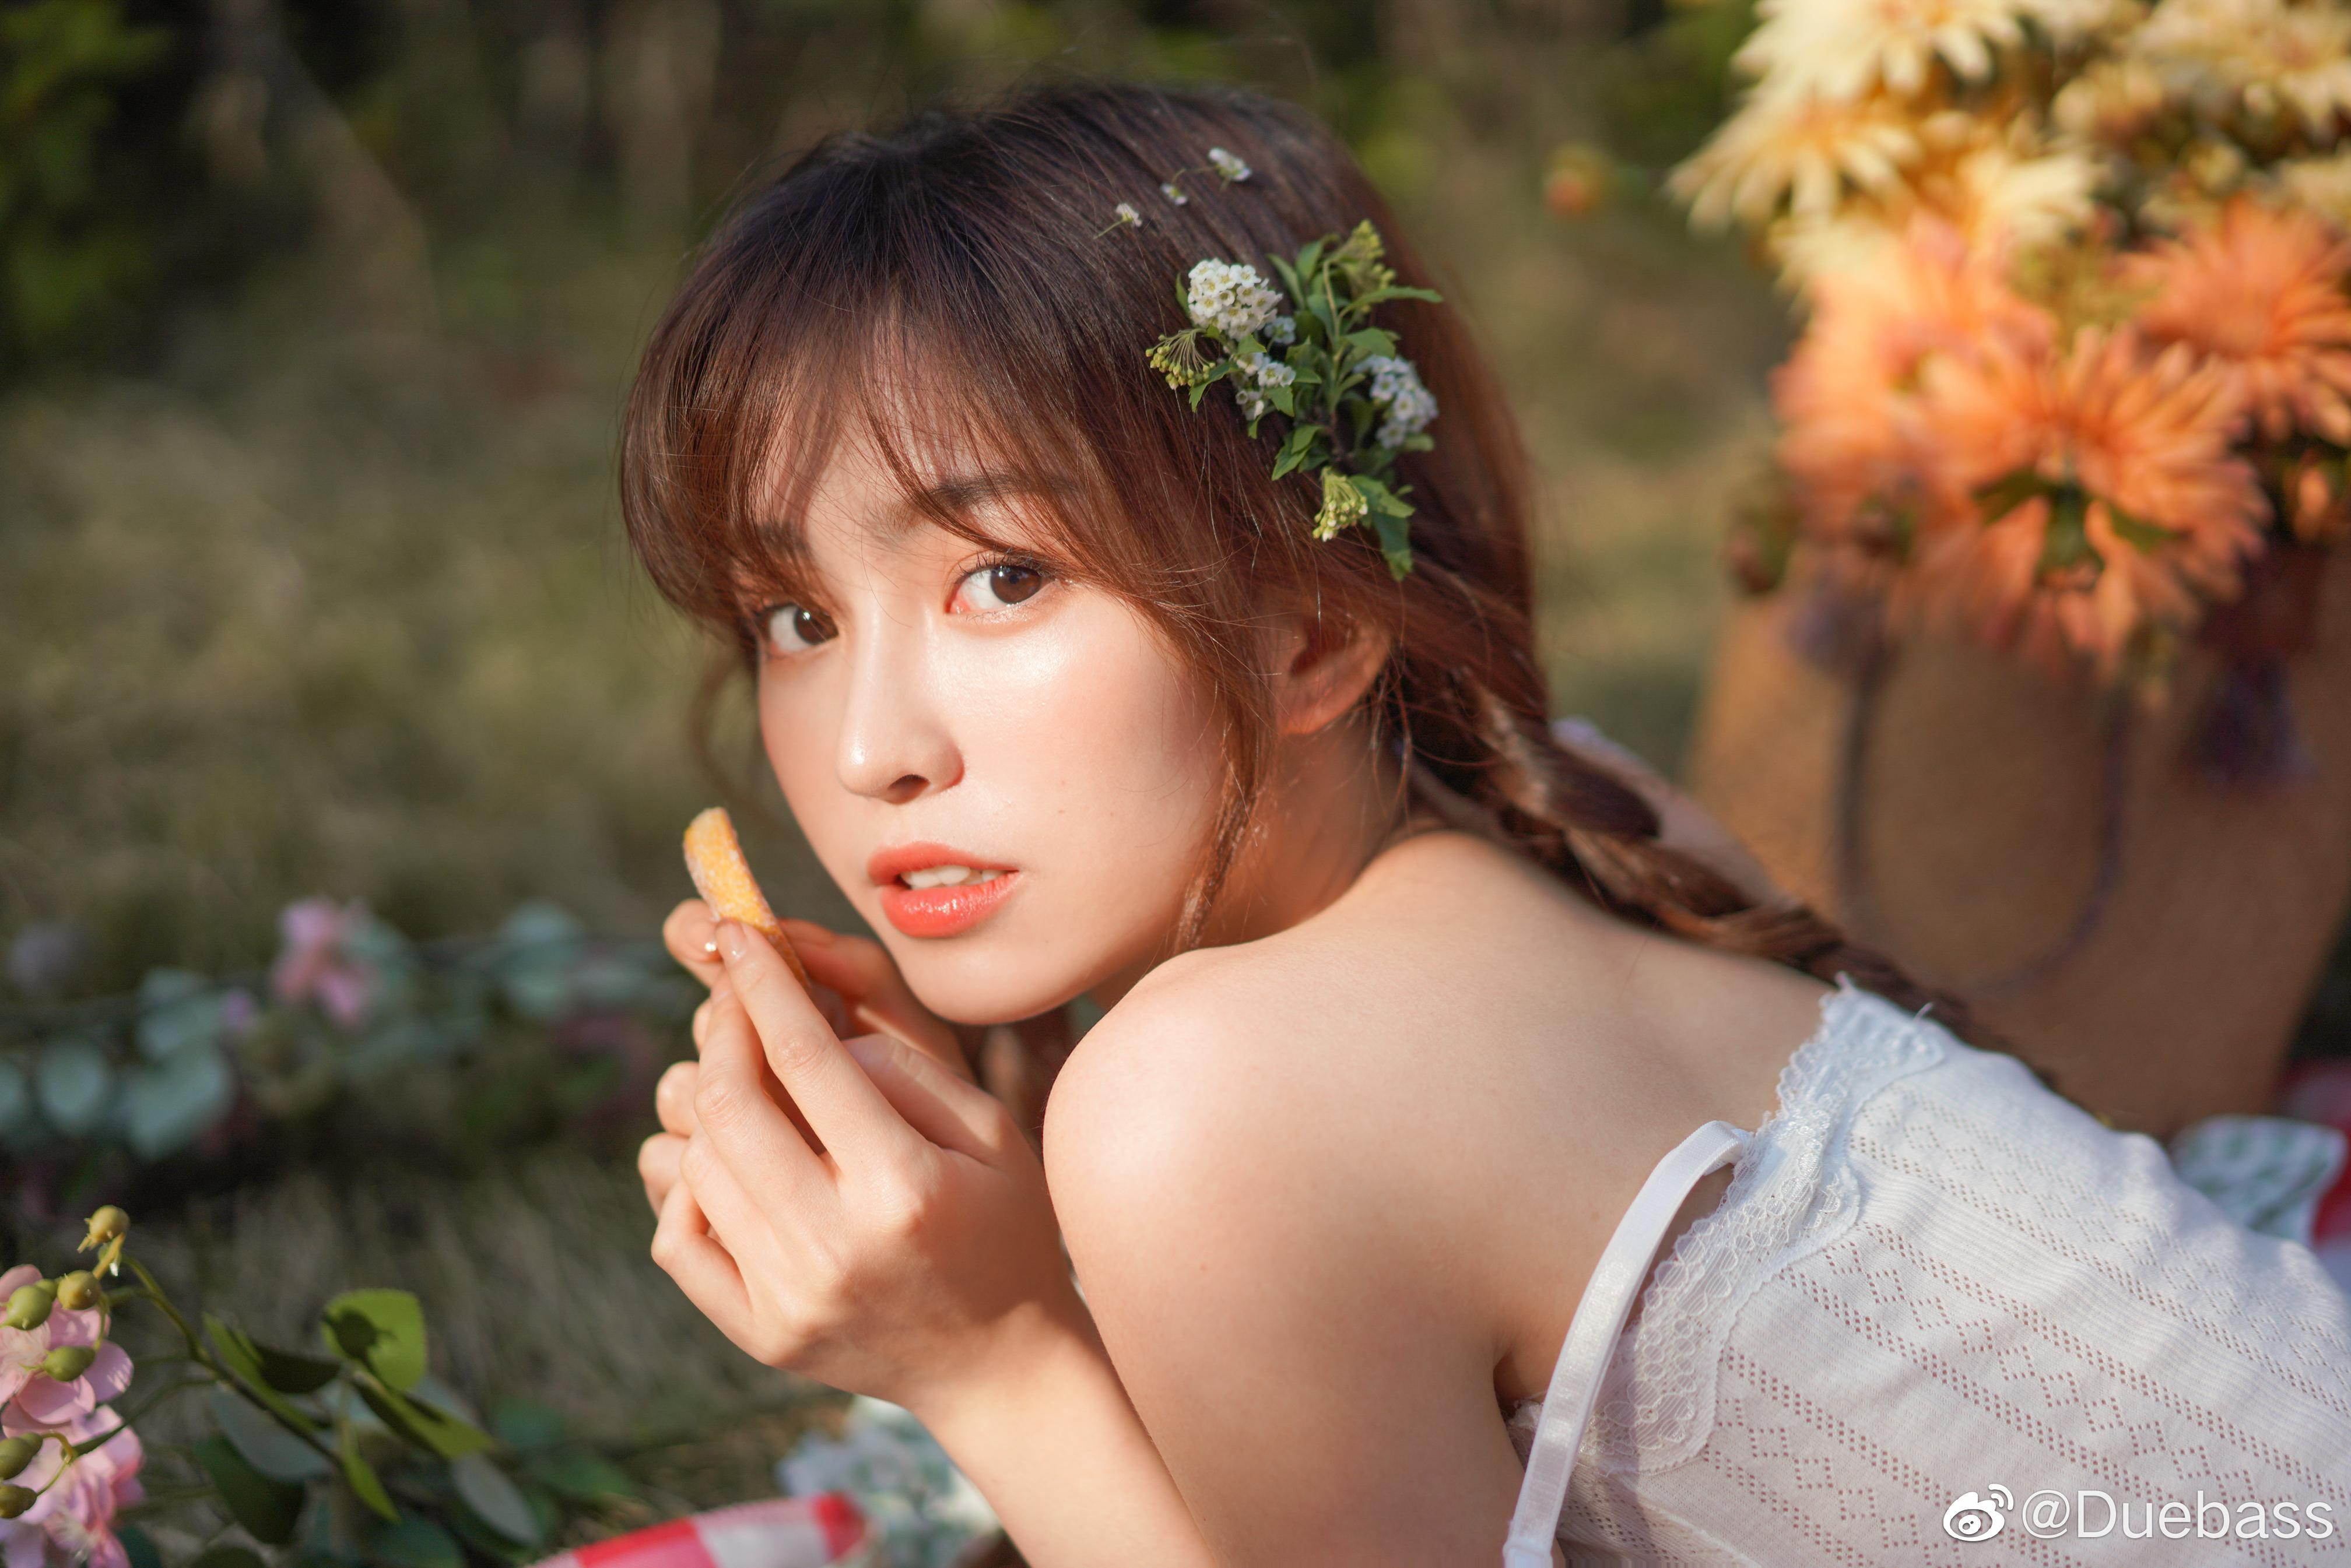 People 4032x2690 qiqi Duebass women Asian brunette flower in hair bare shoulders